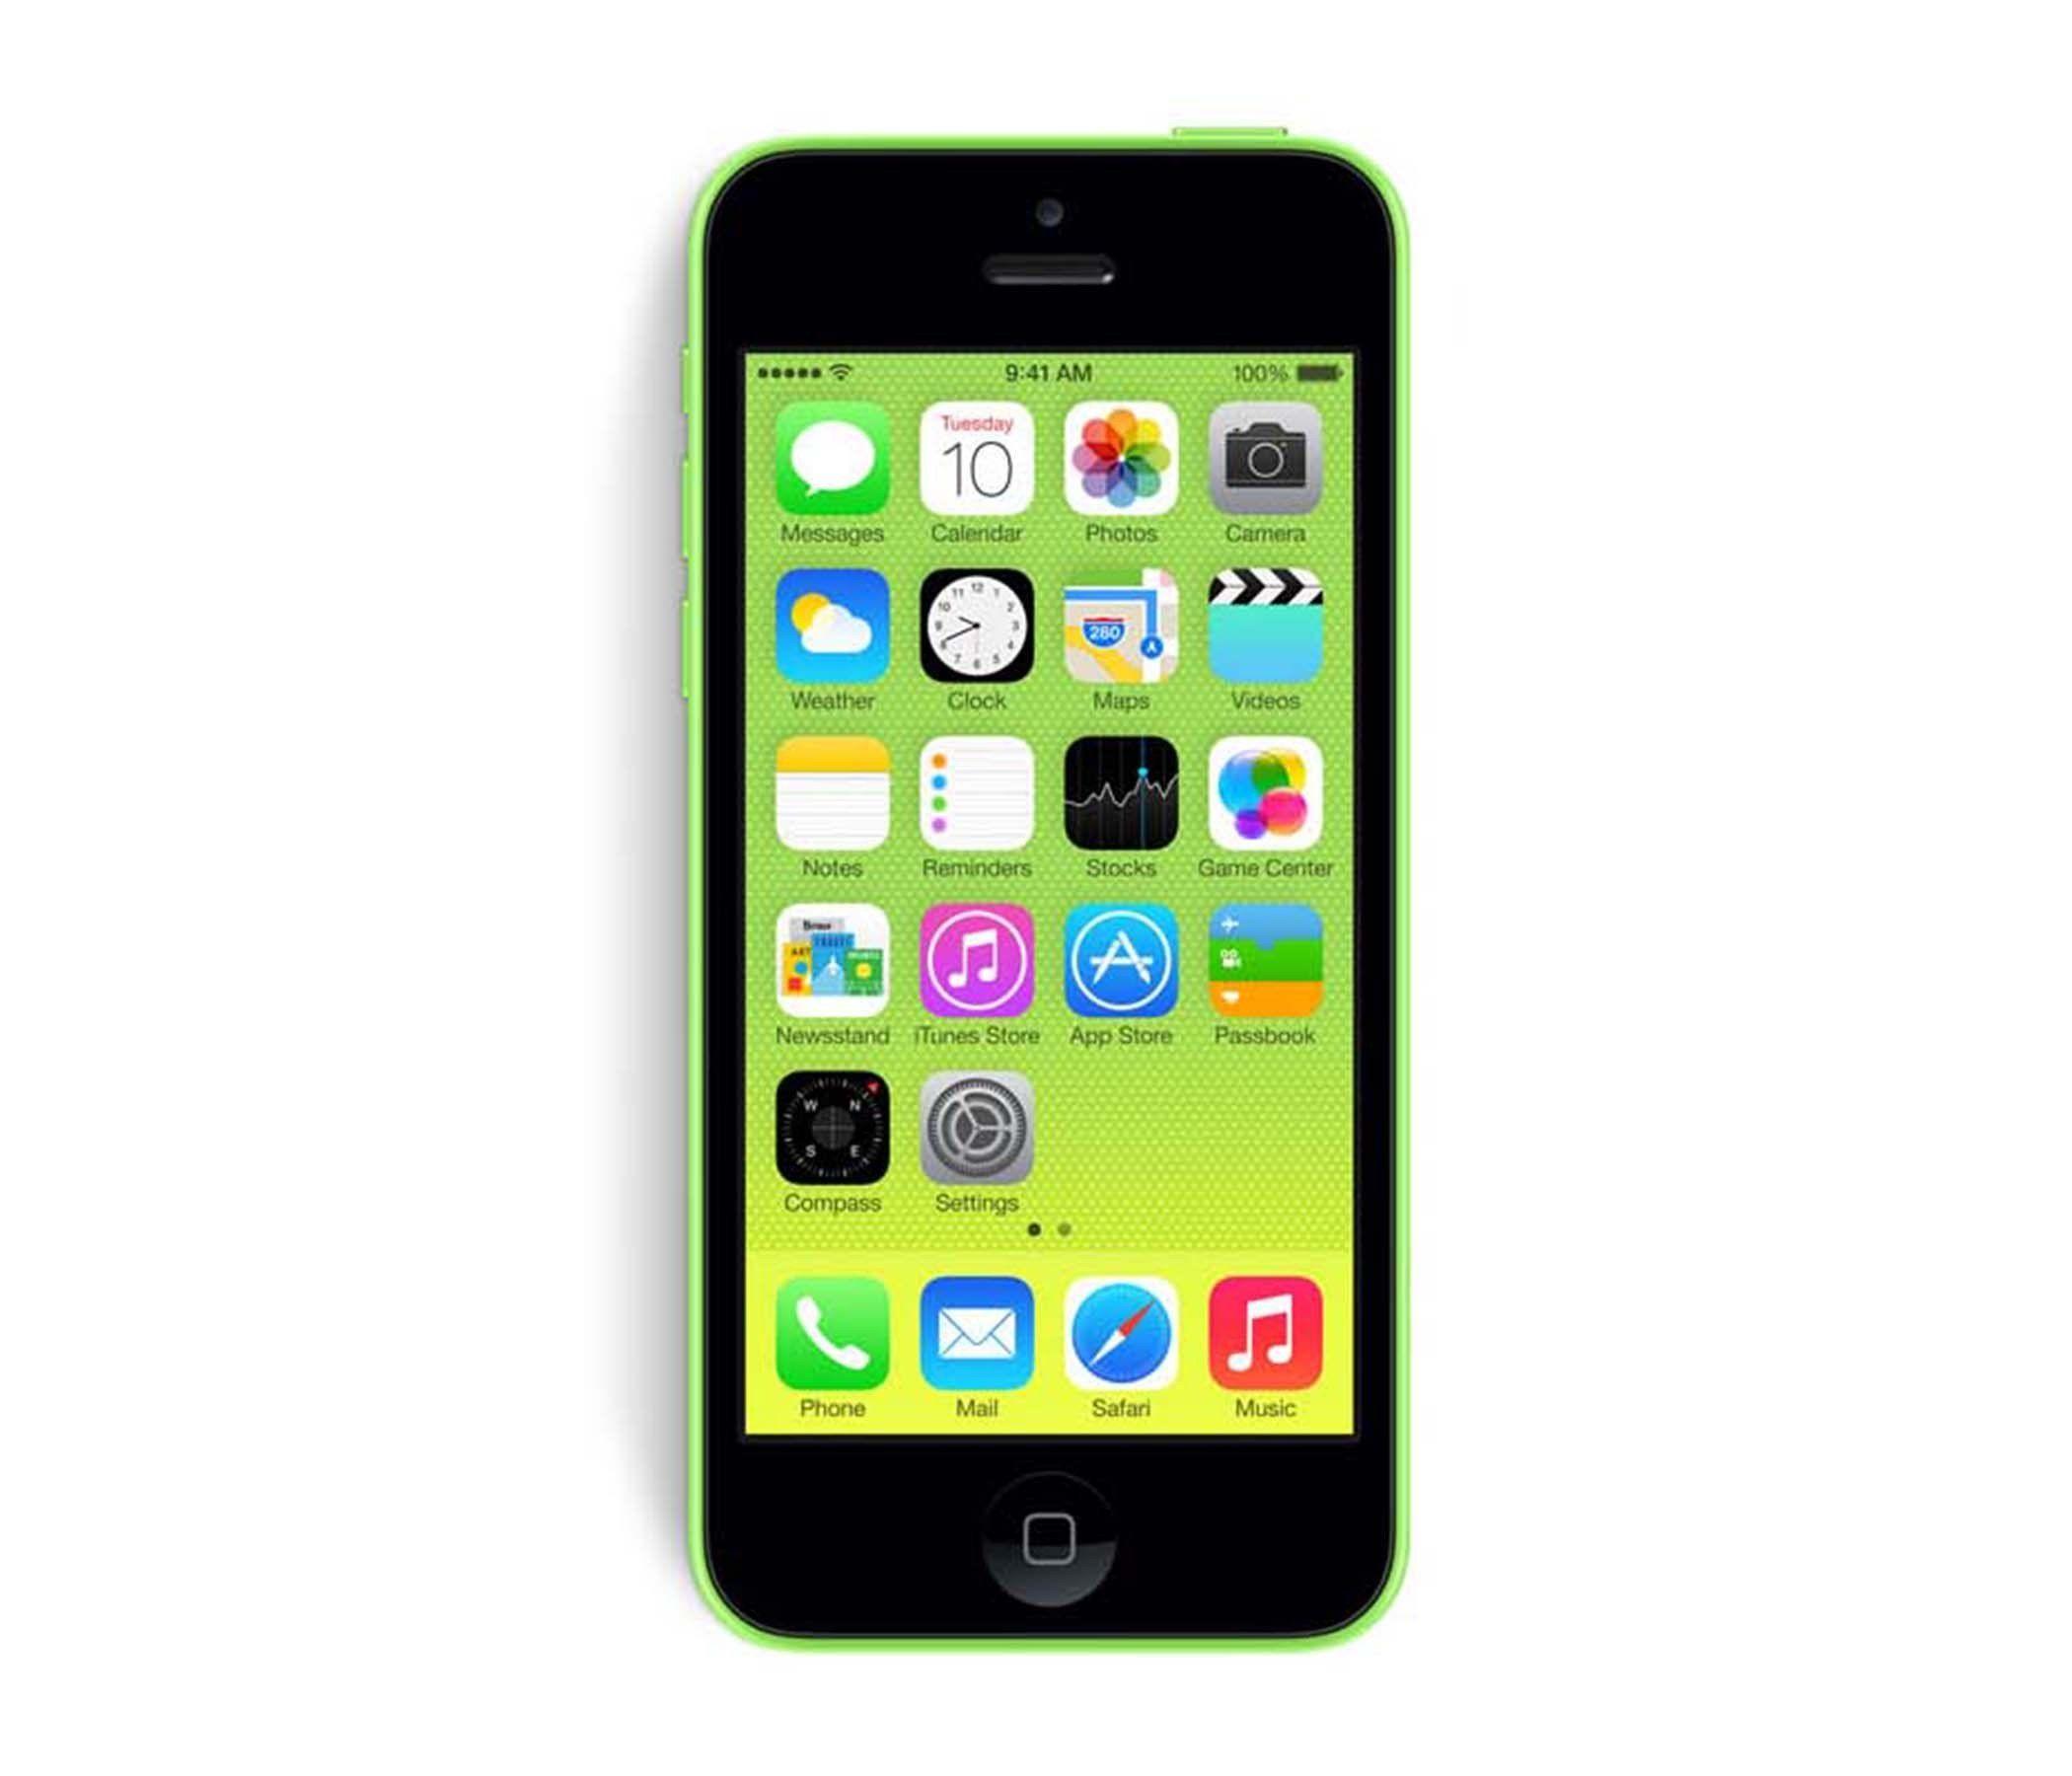 Apple iphone 5c 8 gb apple iphone 5c apple iphone iphone